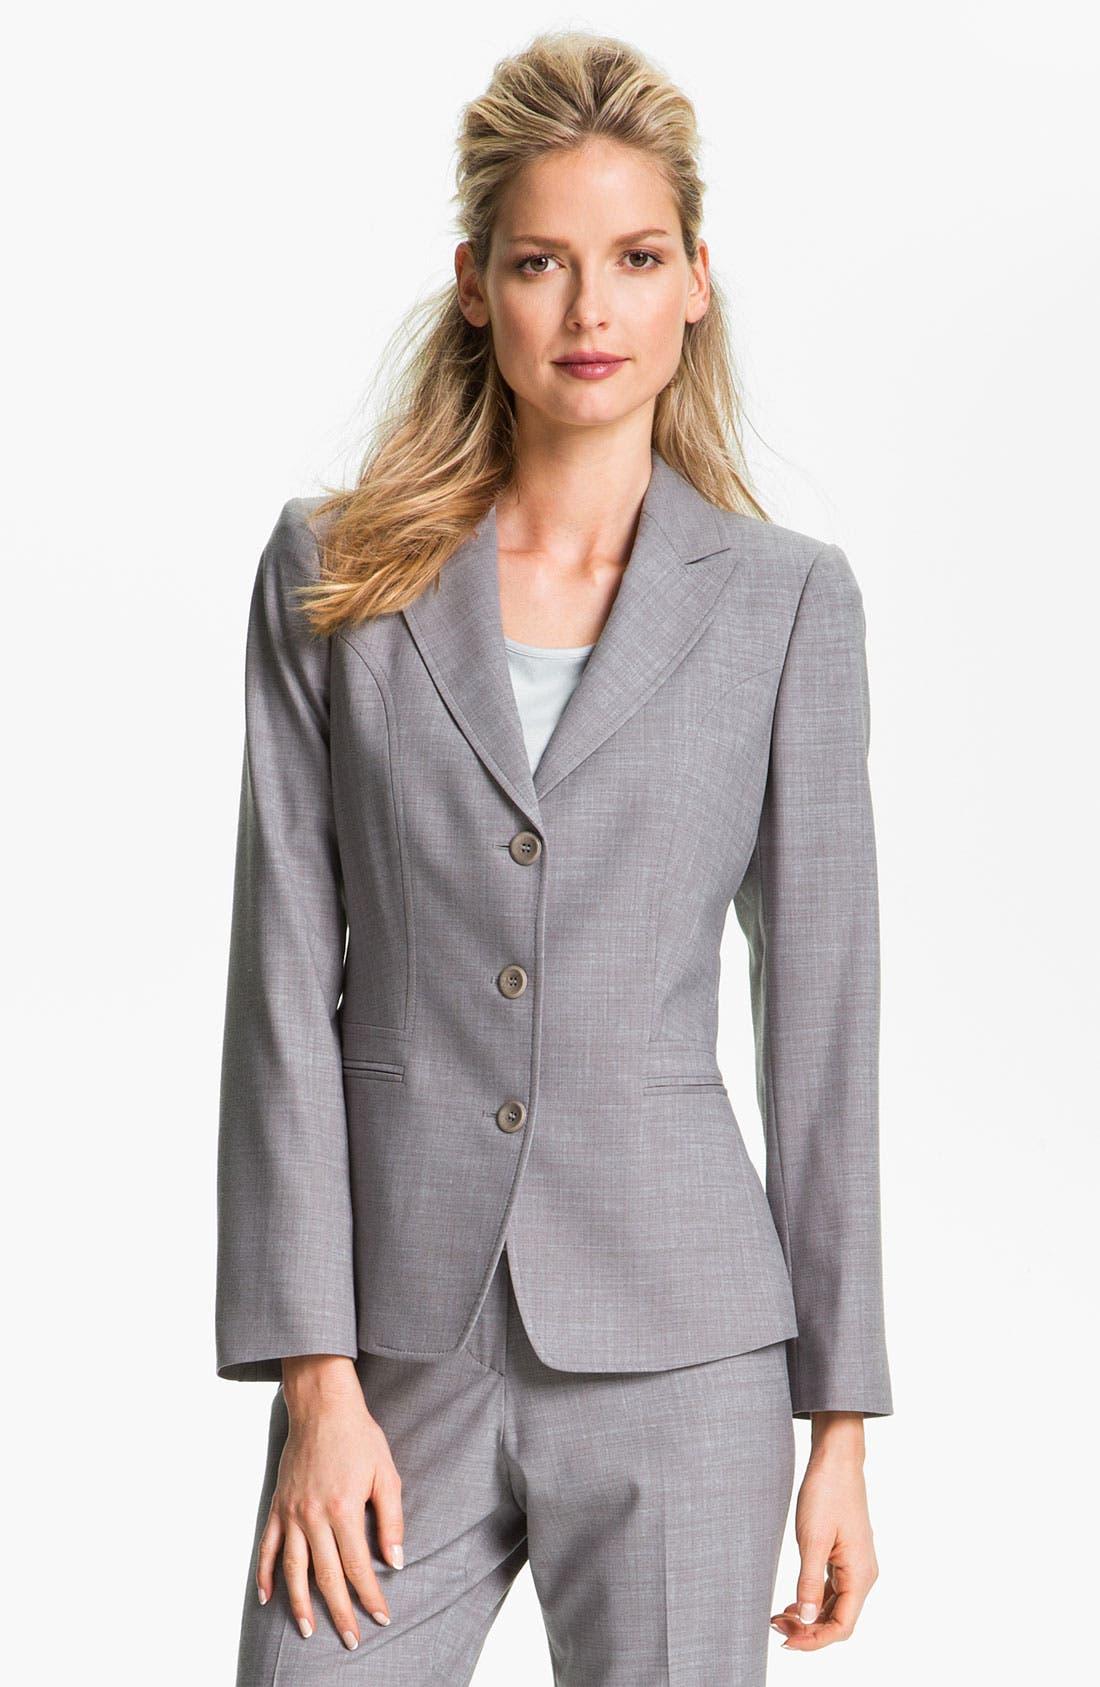 Main Image - Santorelli 'Elena' Jacket